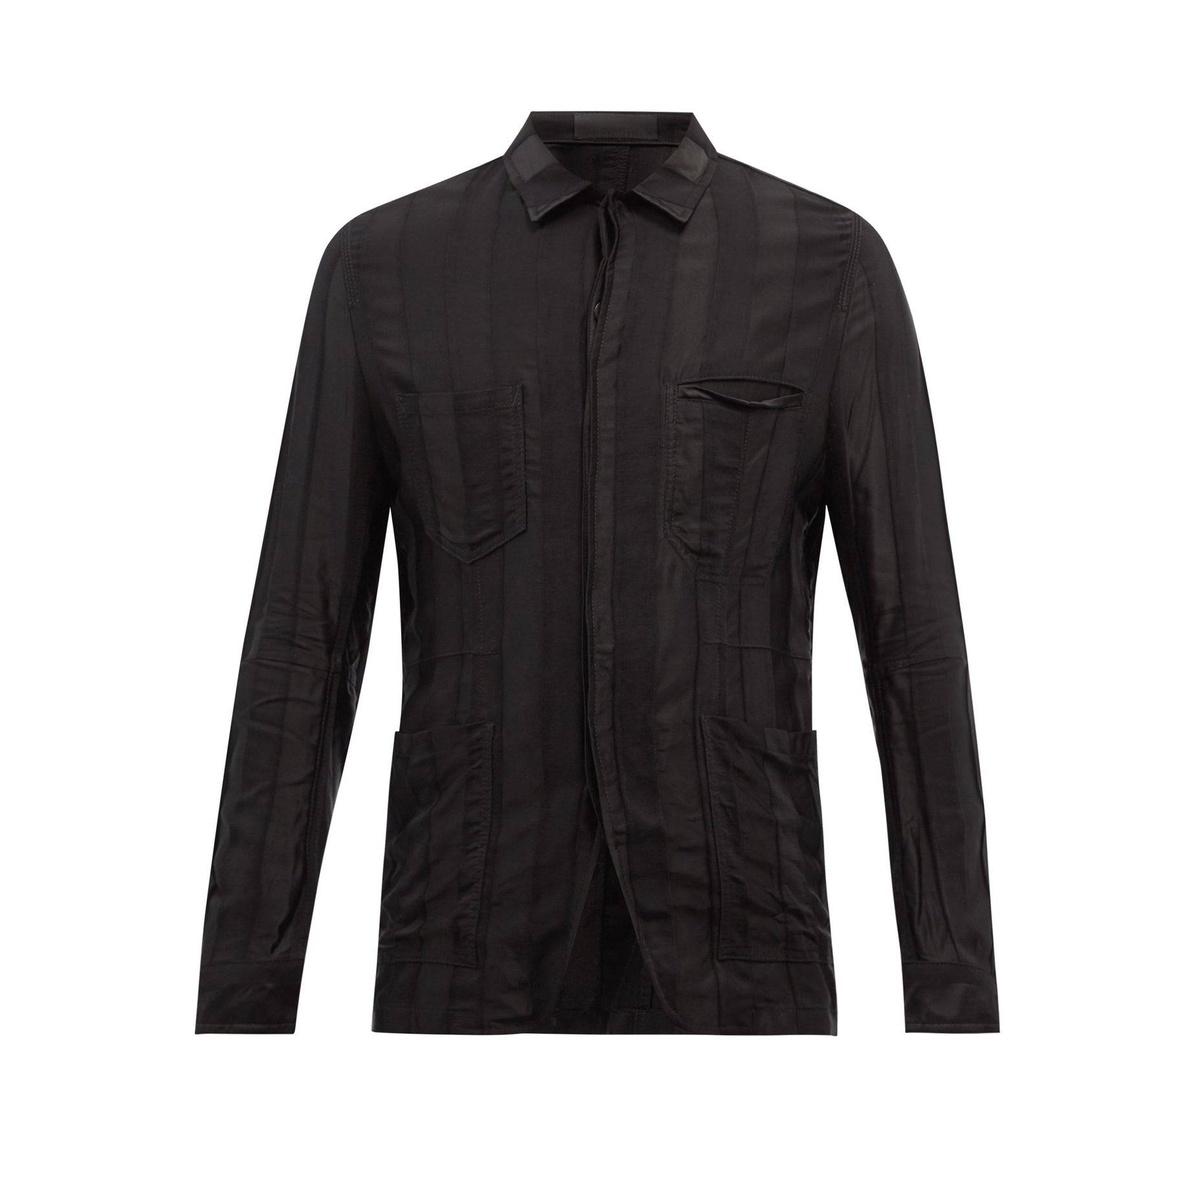 Buy Haider Ackermann Satin Stripe twill shirt style clothing mens 2021 new classic